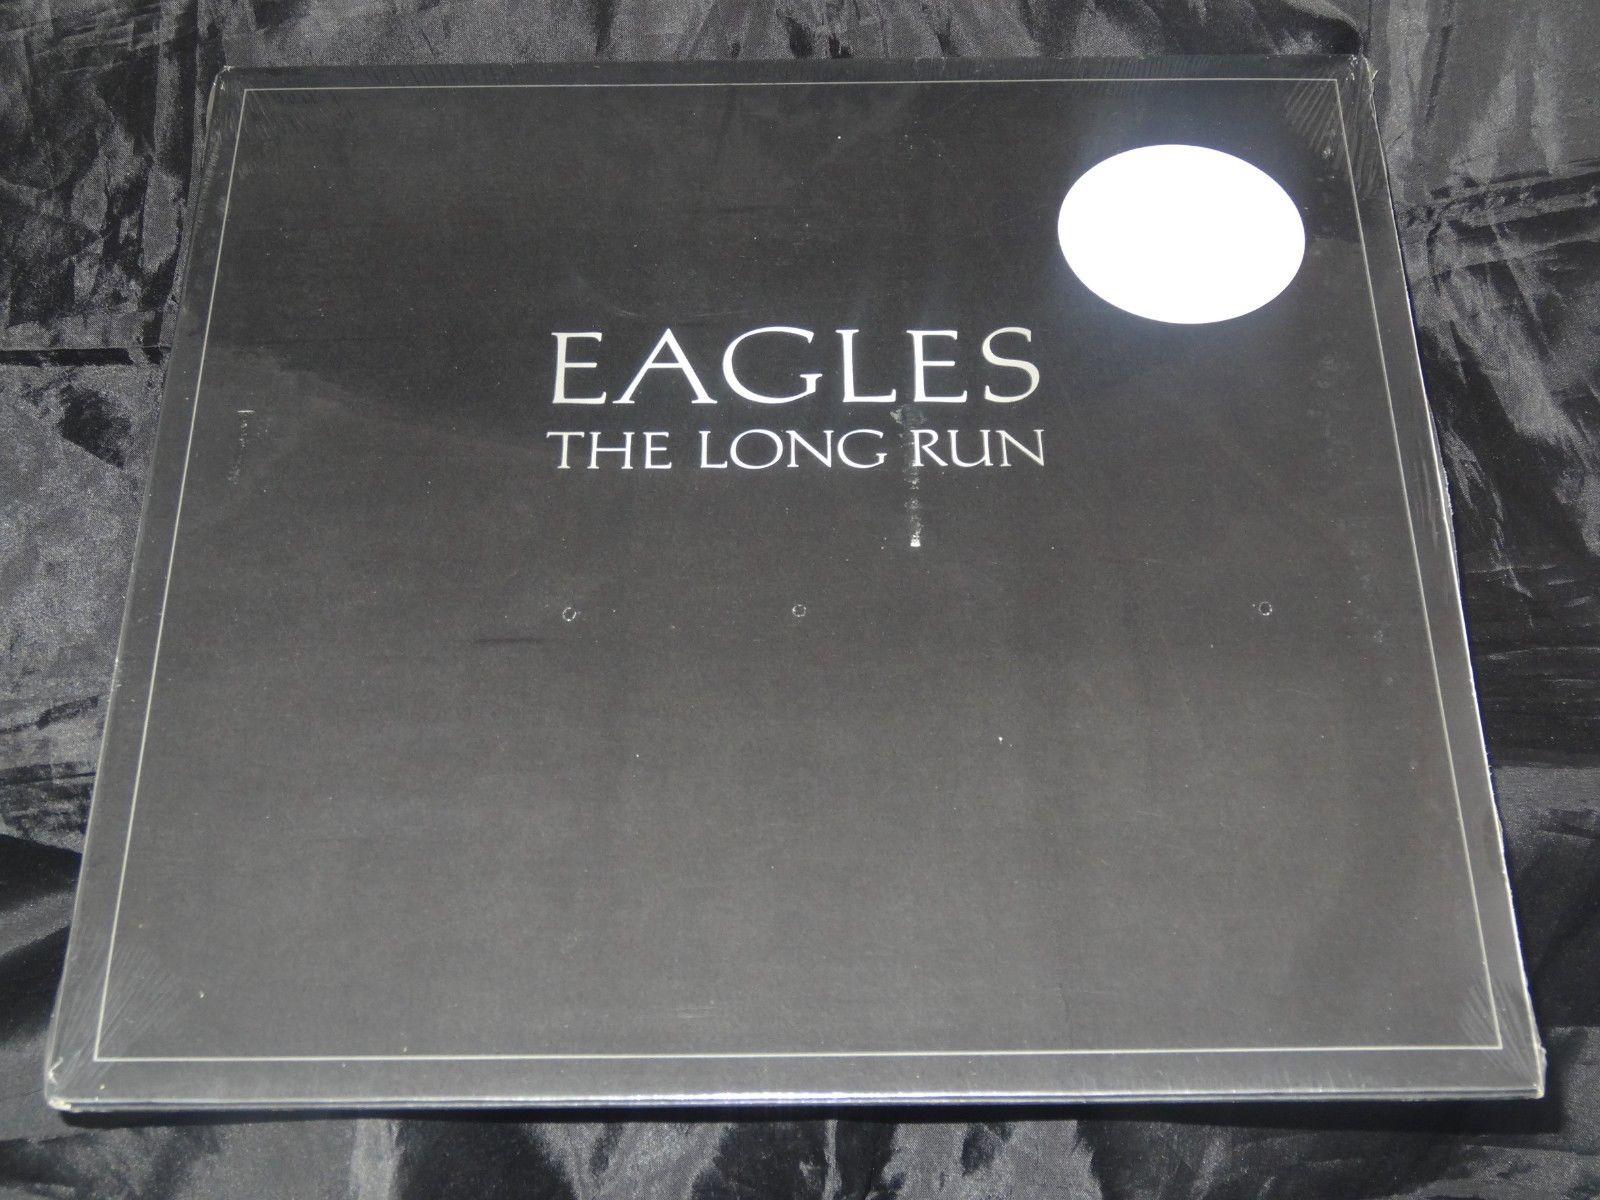 Eagles The Long Run Sealed Vinyl Record Lp Album USA 1979 Orig Hype Sticker